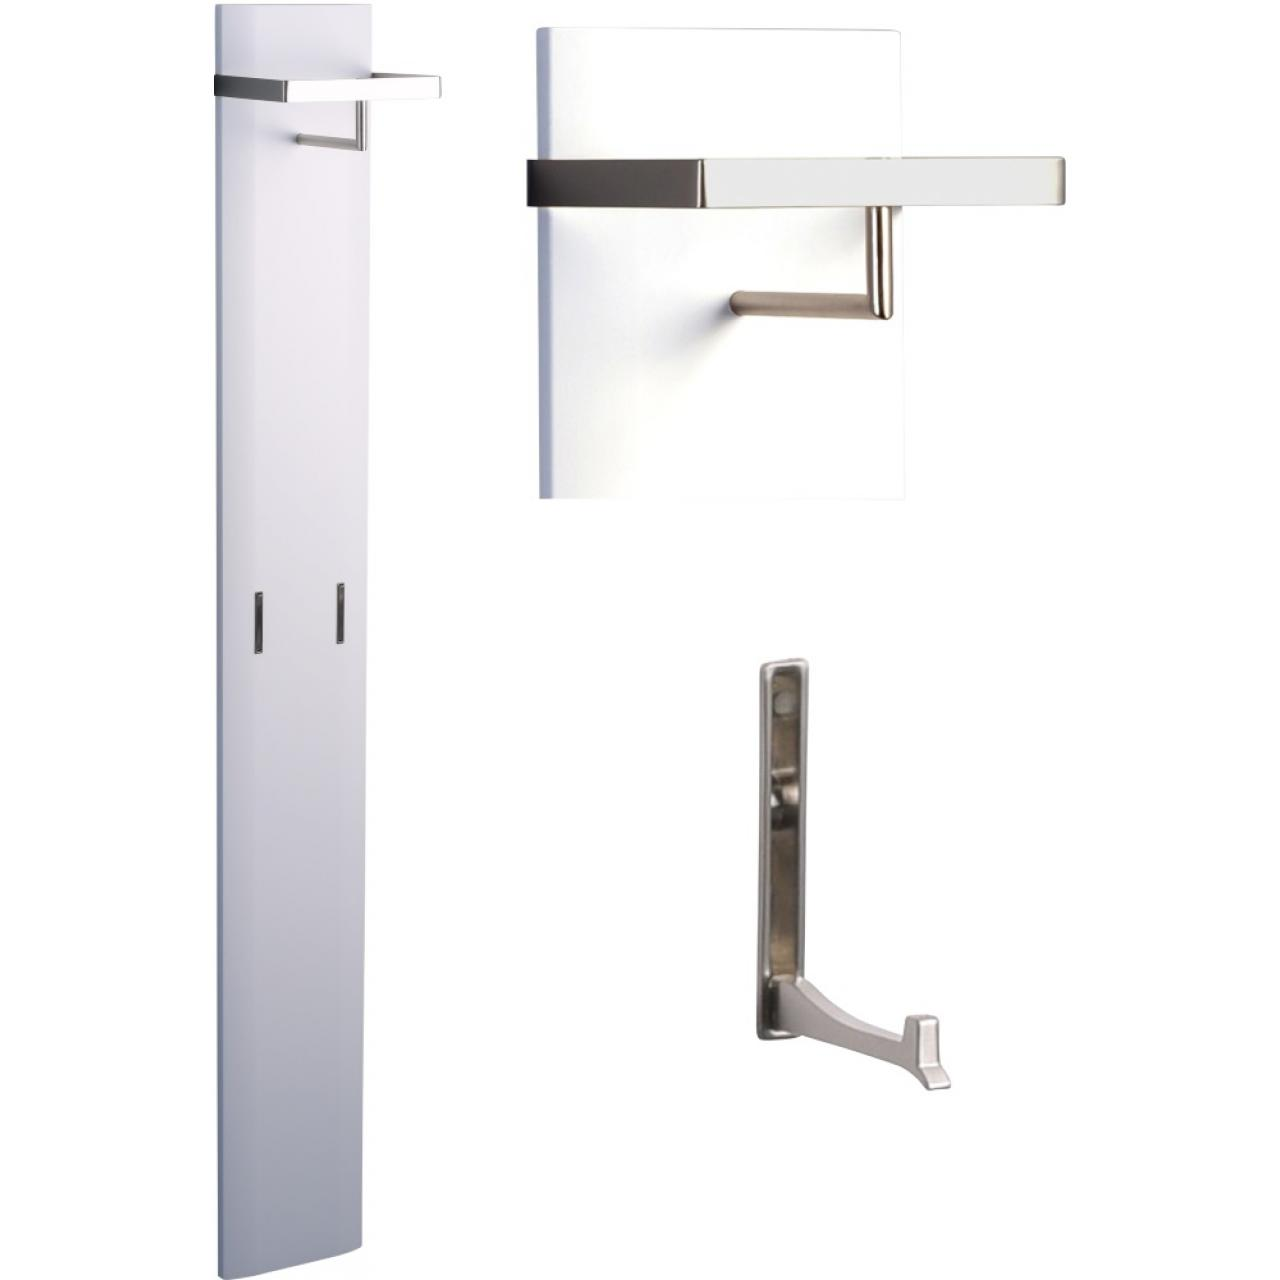 Garderobe Aruba 2 Wandgarderobe Weiß Metall Edelstahloptik Ausklappbar 2 Haken